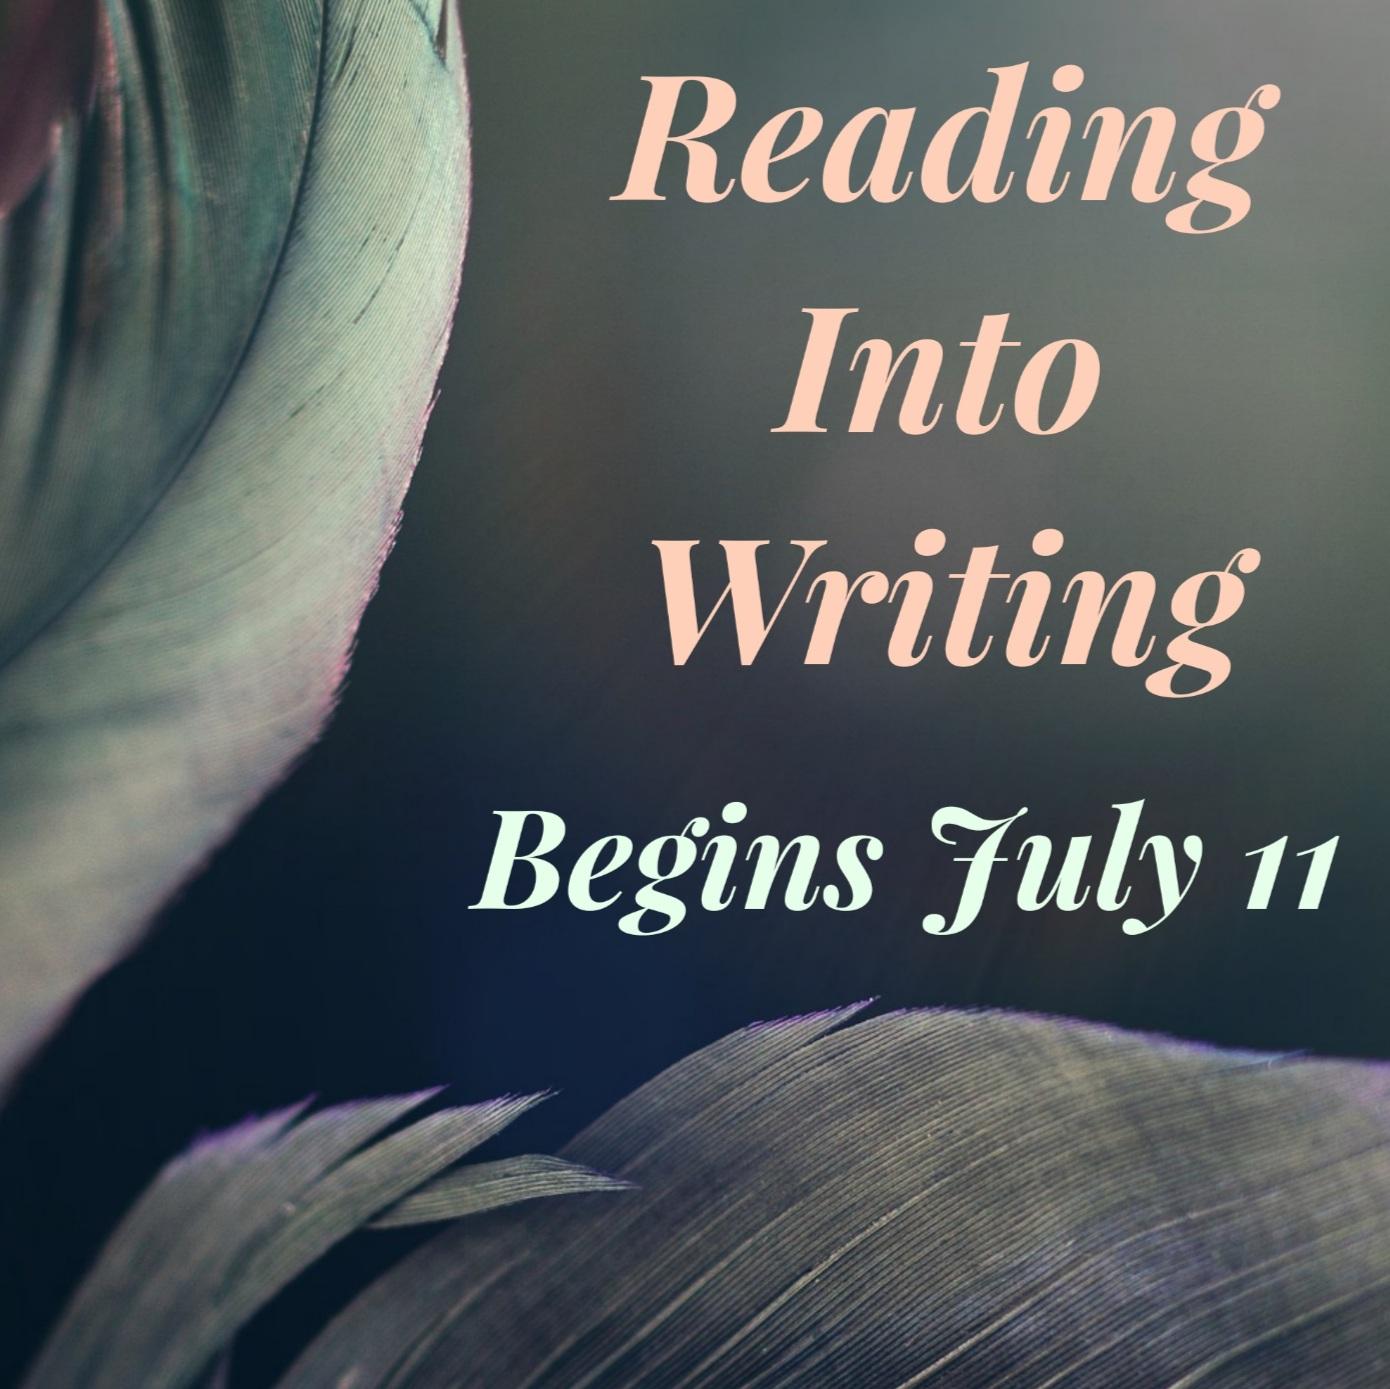 Reading into Writing image